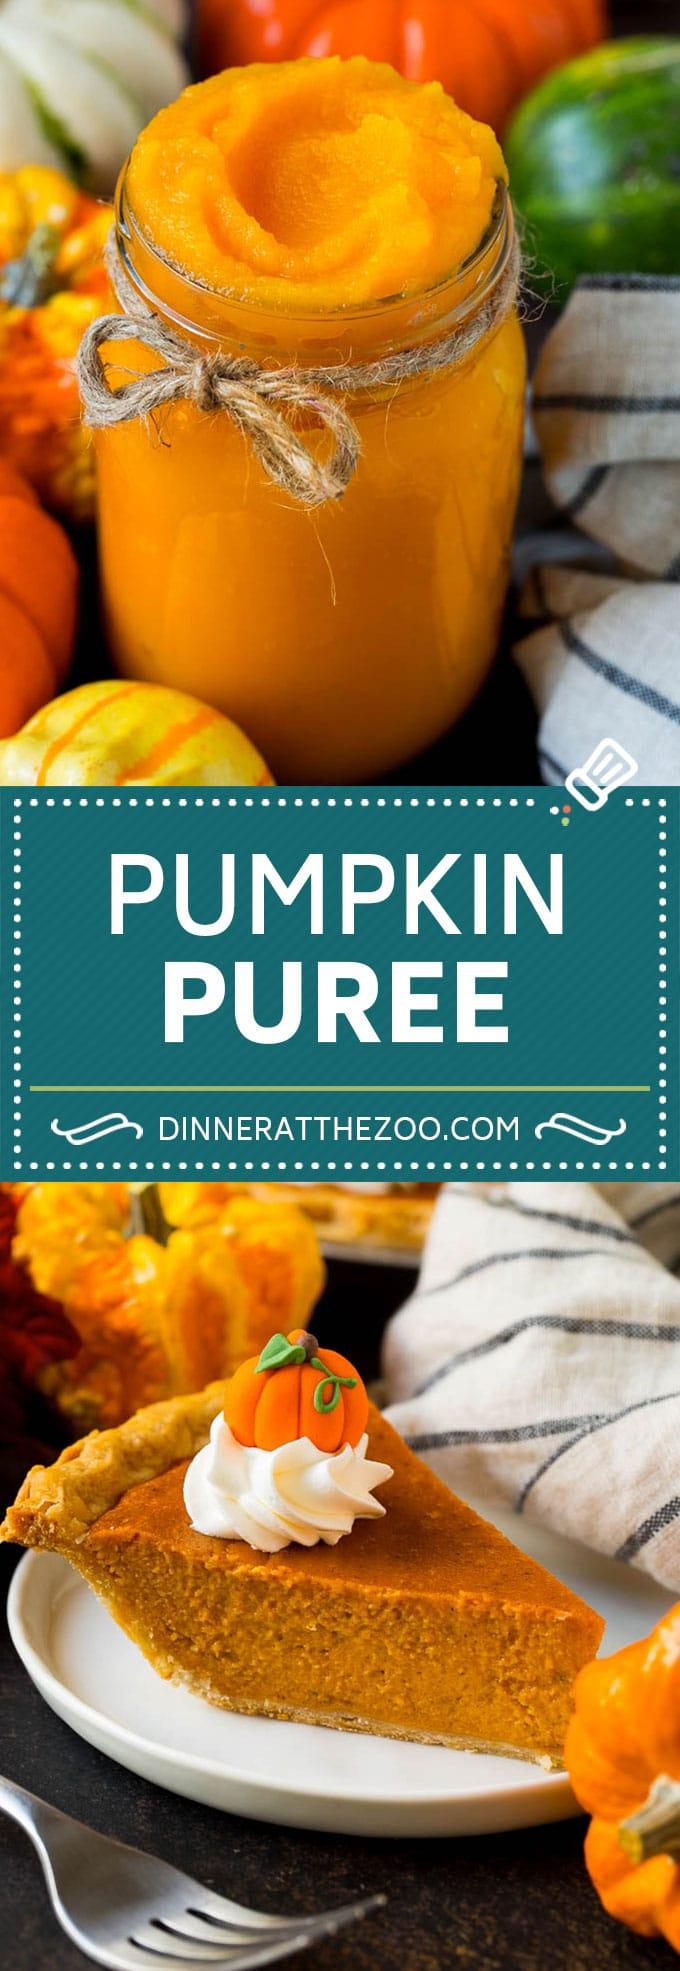 Pumpkin Puree Recipe #pumpkin #baking #fall #thanksgiving #dinneratthezoo